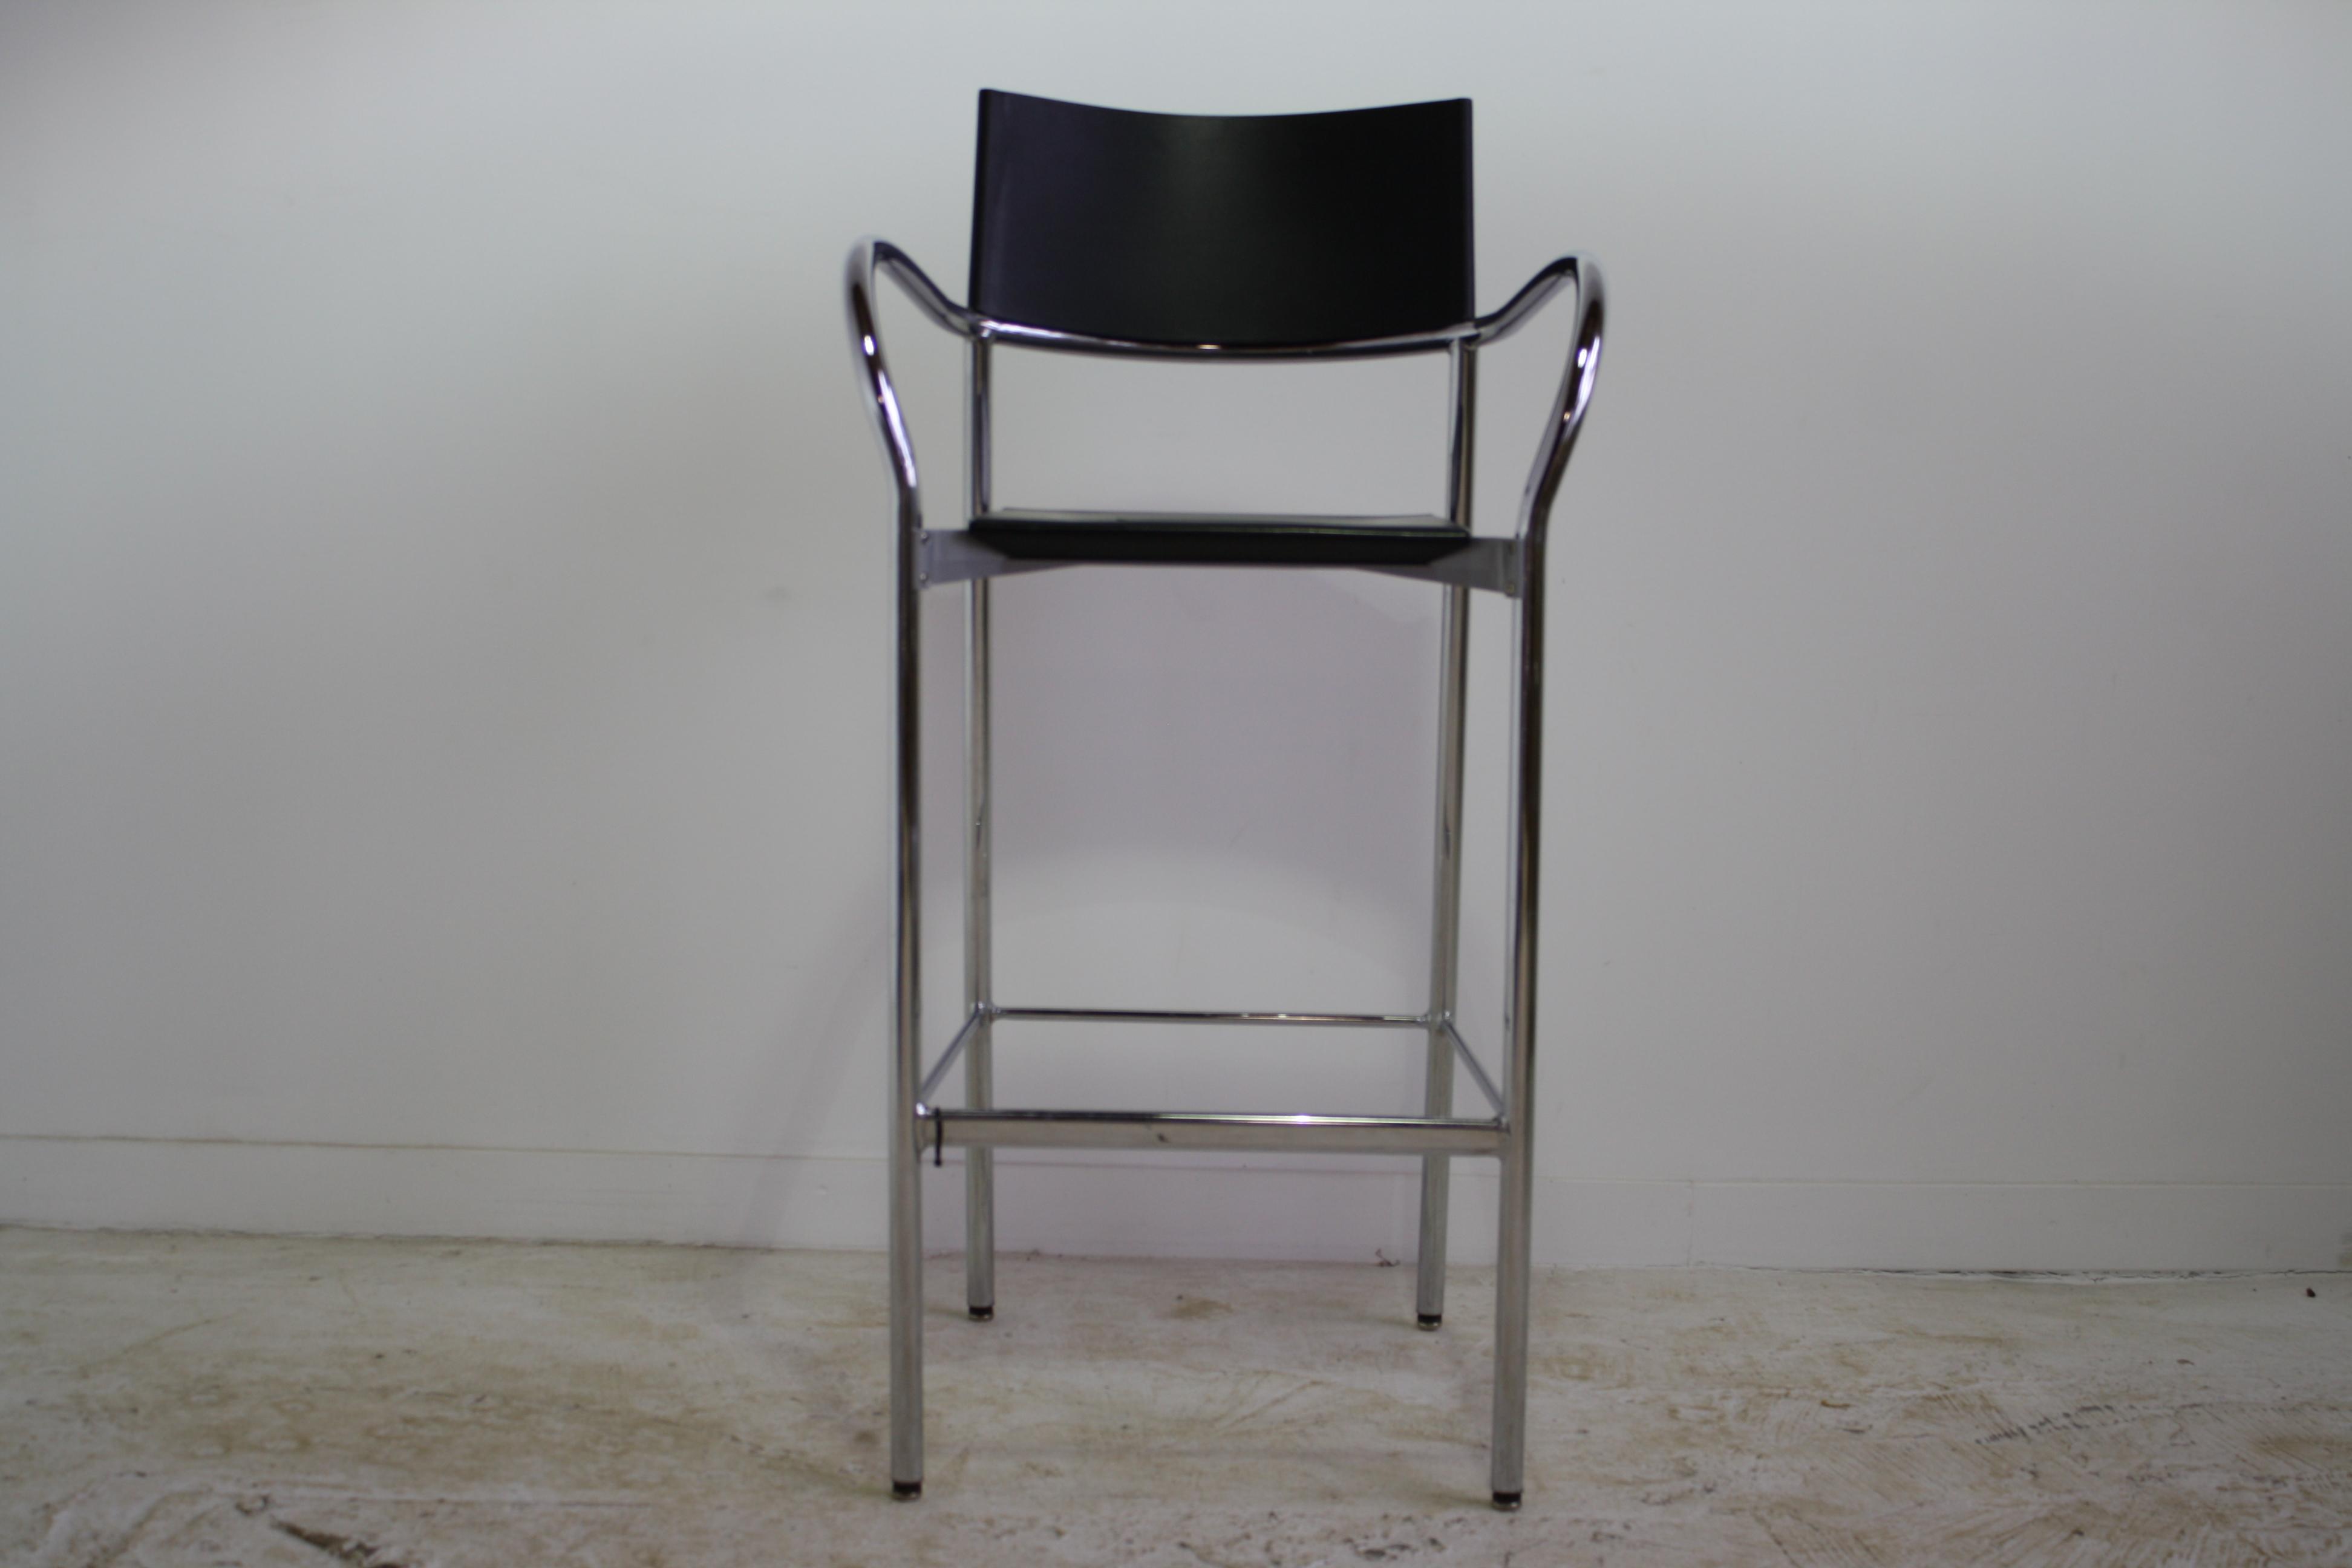 Segis Breeze Bar Stool by Carlo Bartoli 20 Avail Chairish : segis breeze bar stool by carlo bartoli 20 avail 8106aspectfitampwidth640ampheight640 from www.chairish.com size 640 x 640 jpeg 22kB